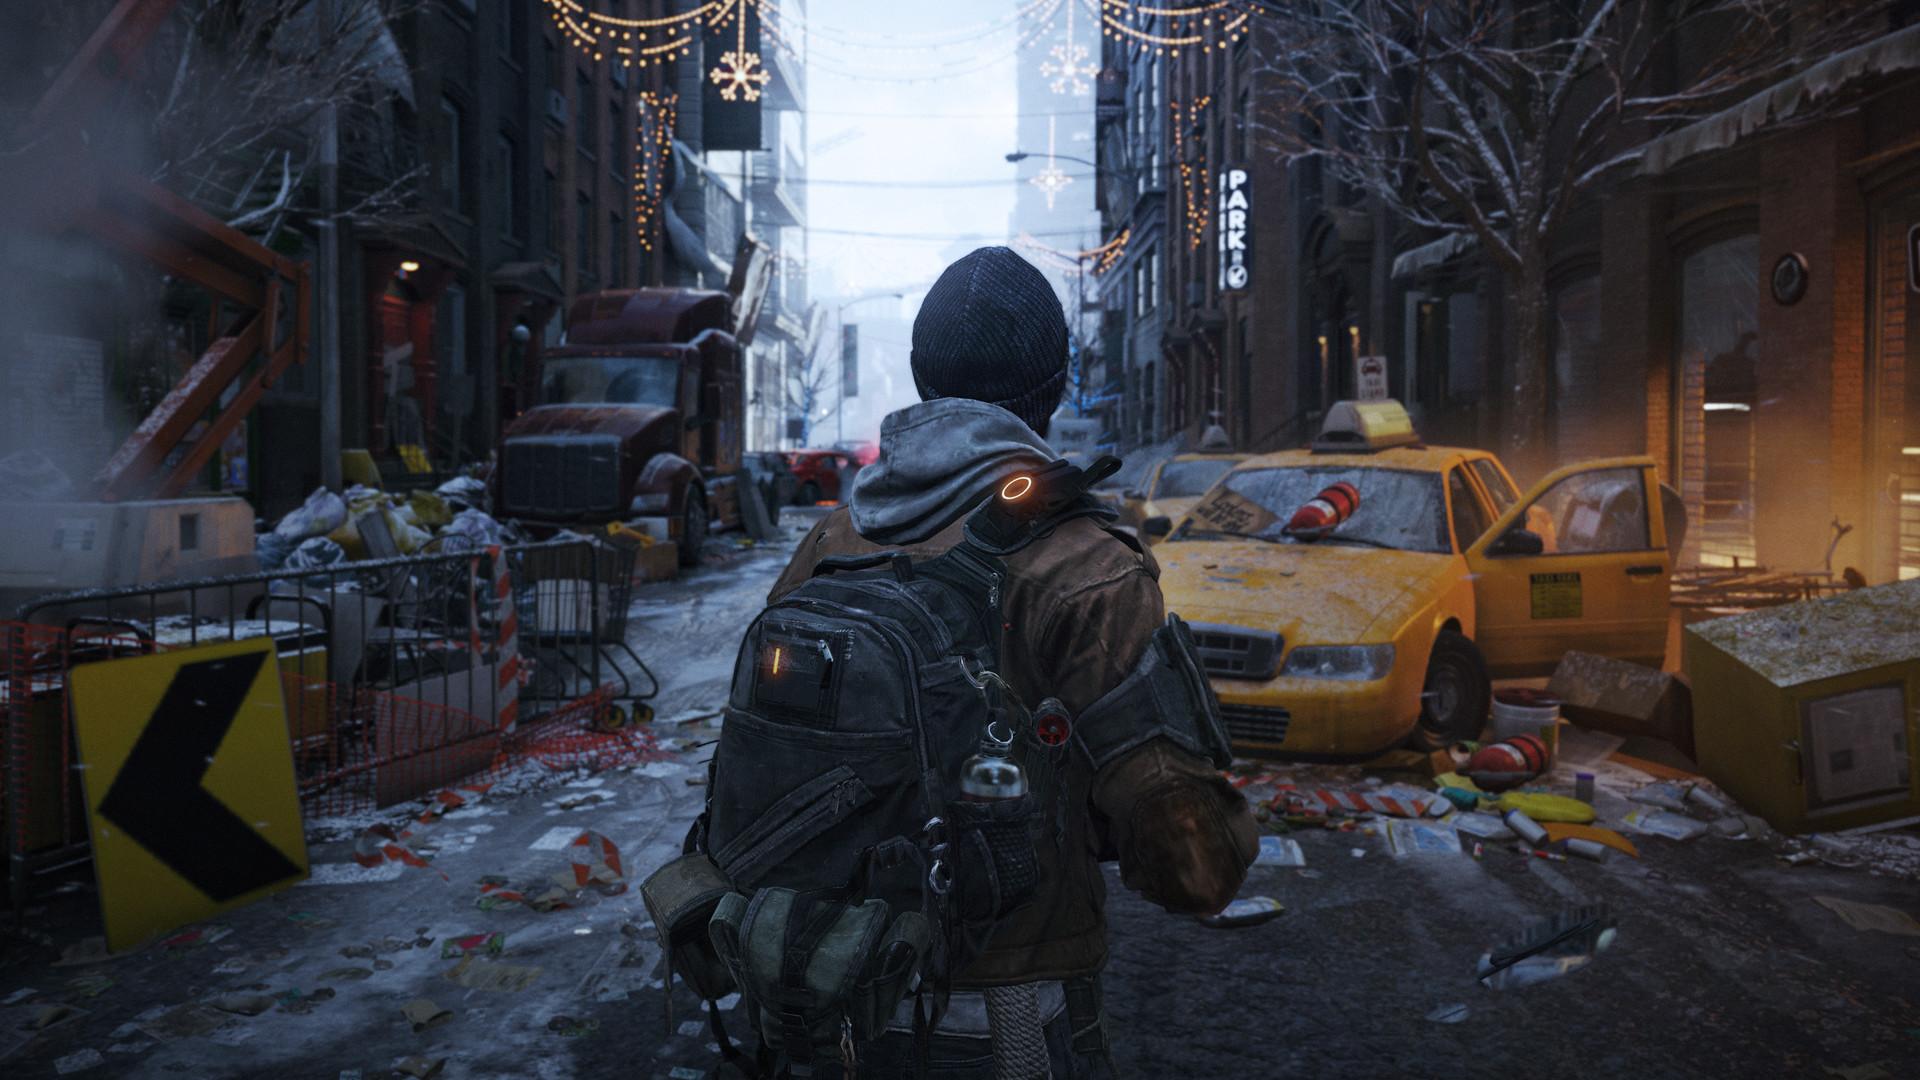 Скриншот игры [Аккаунт] Tom Clancy's The Division